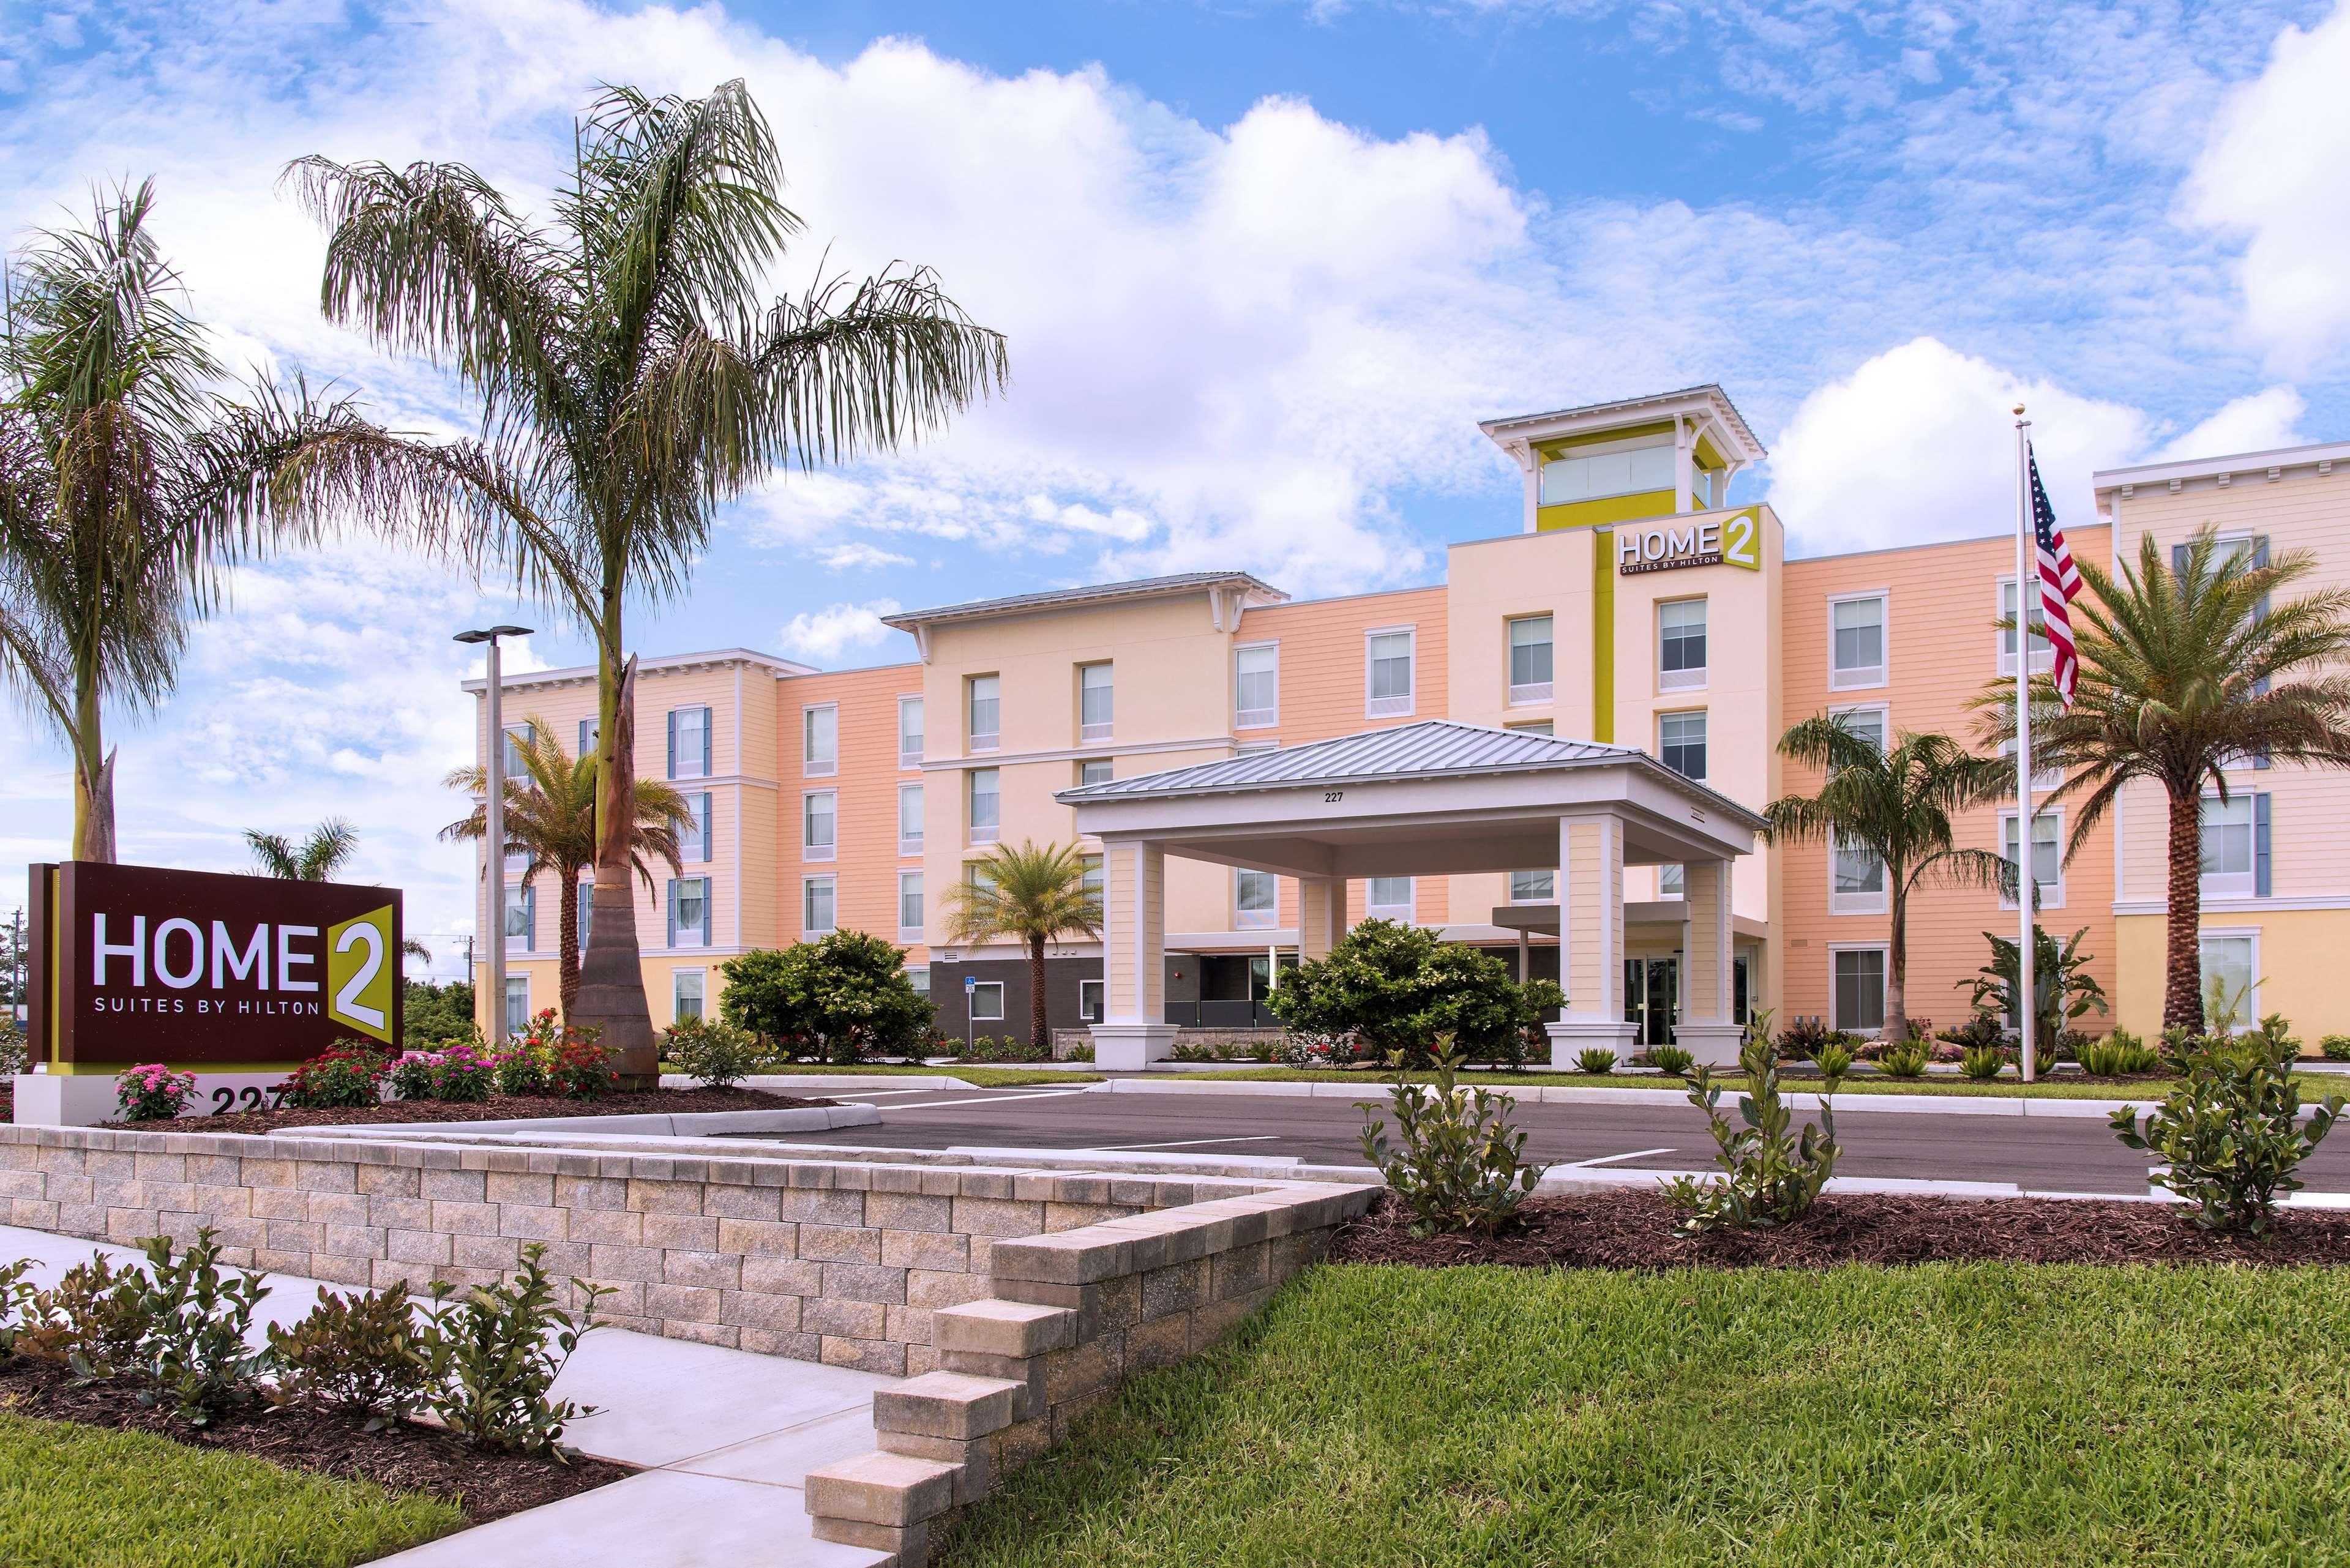 Home2 Suites by Hilton Nokomis Sarasota Casey Key image 0